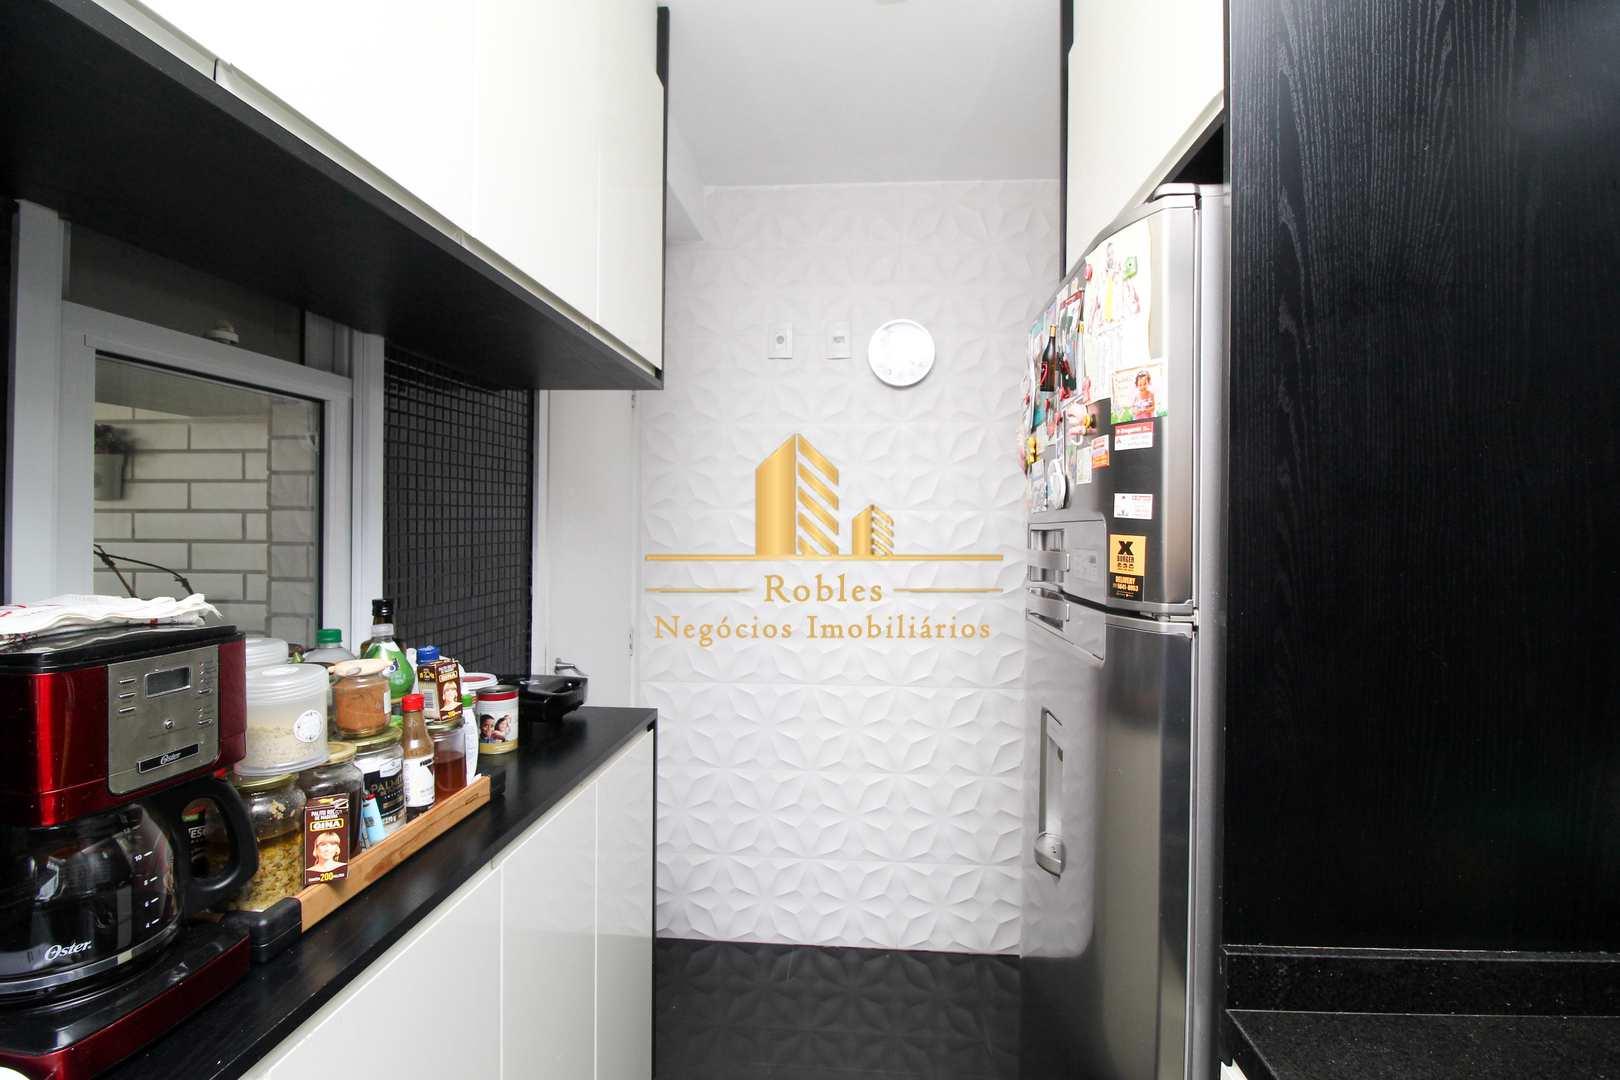 Apartamento com 2 dorms, Granja Julieta, São Paulo - R$ 1.25 mi, Cod: 2153